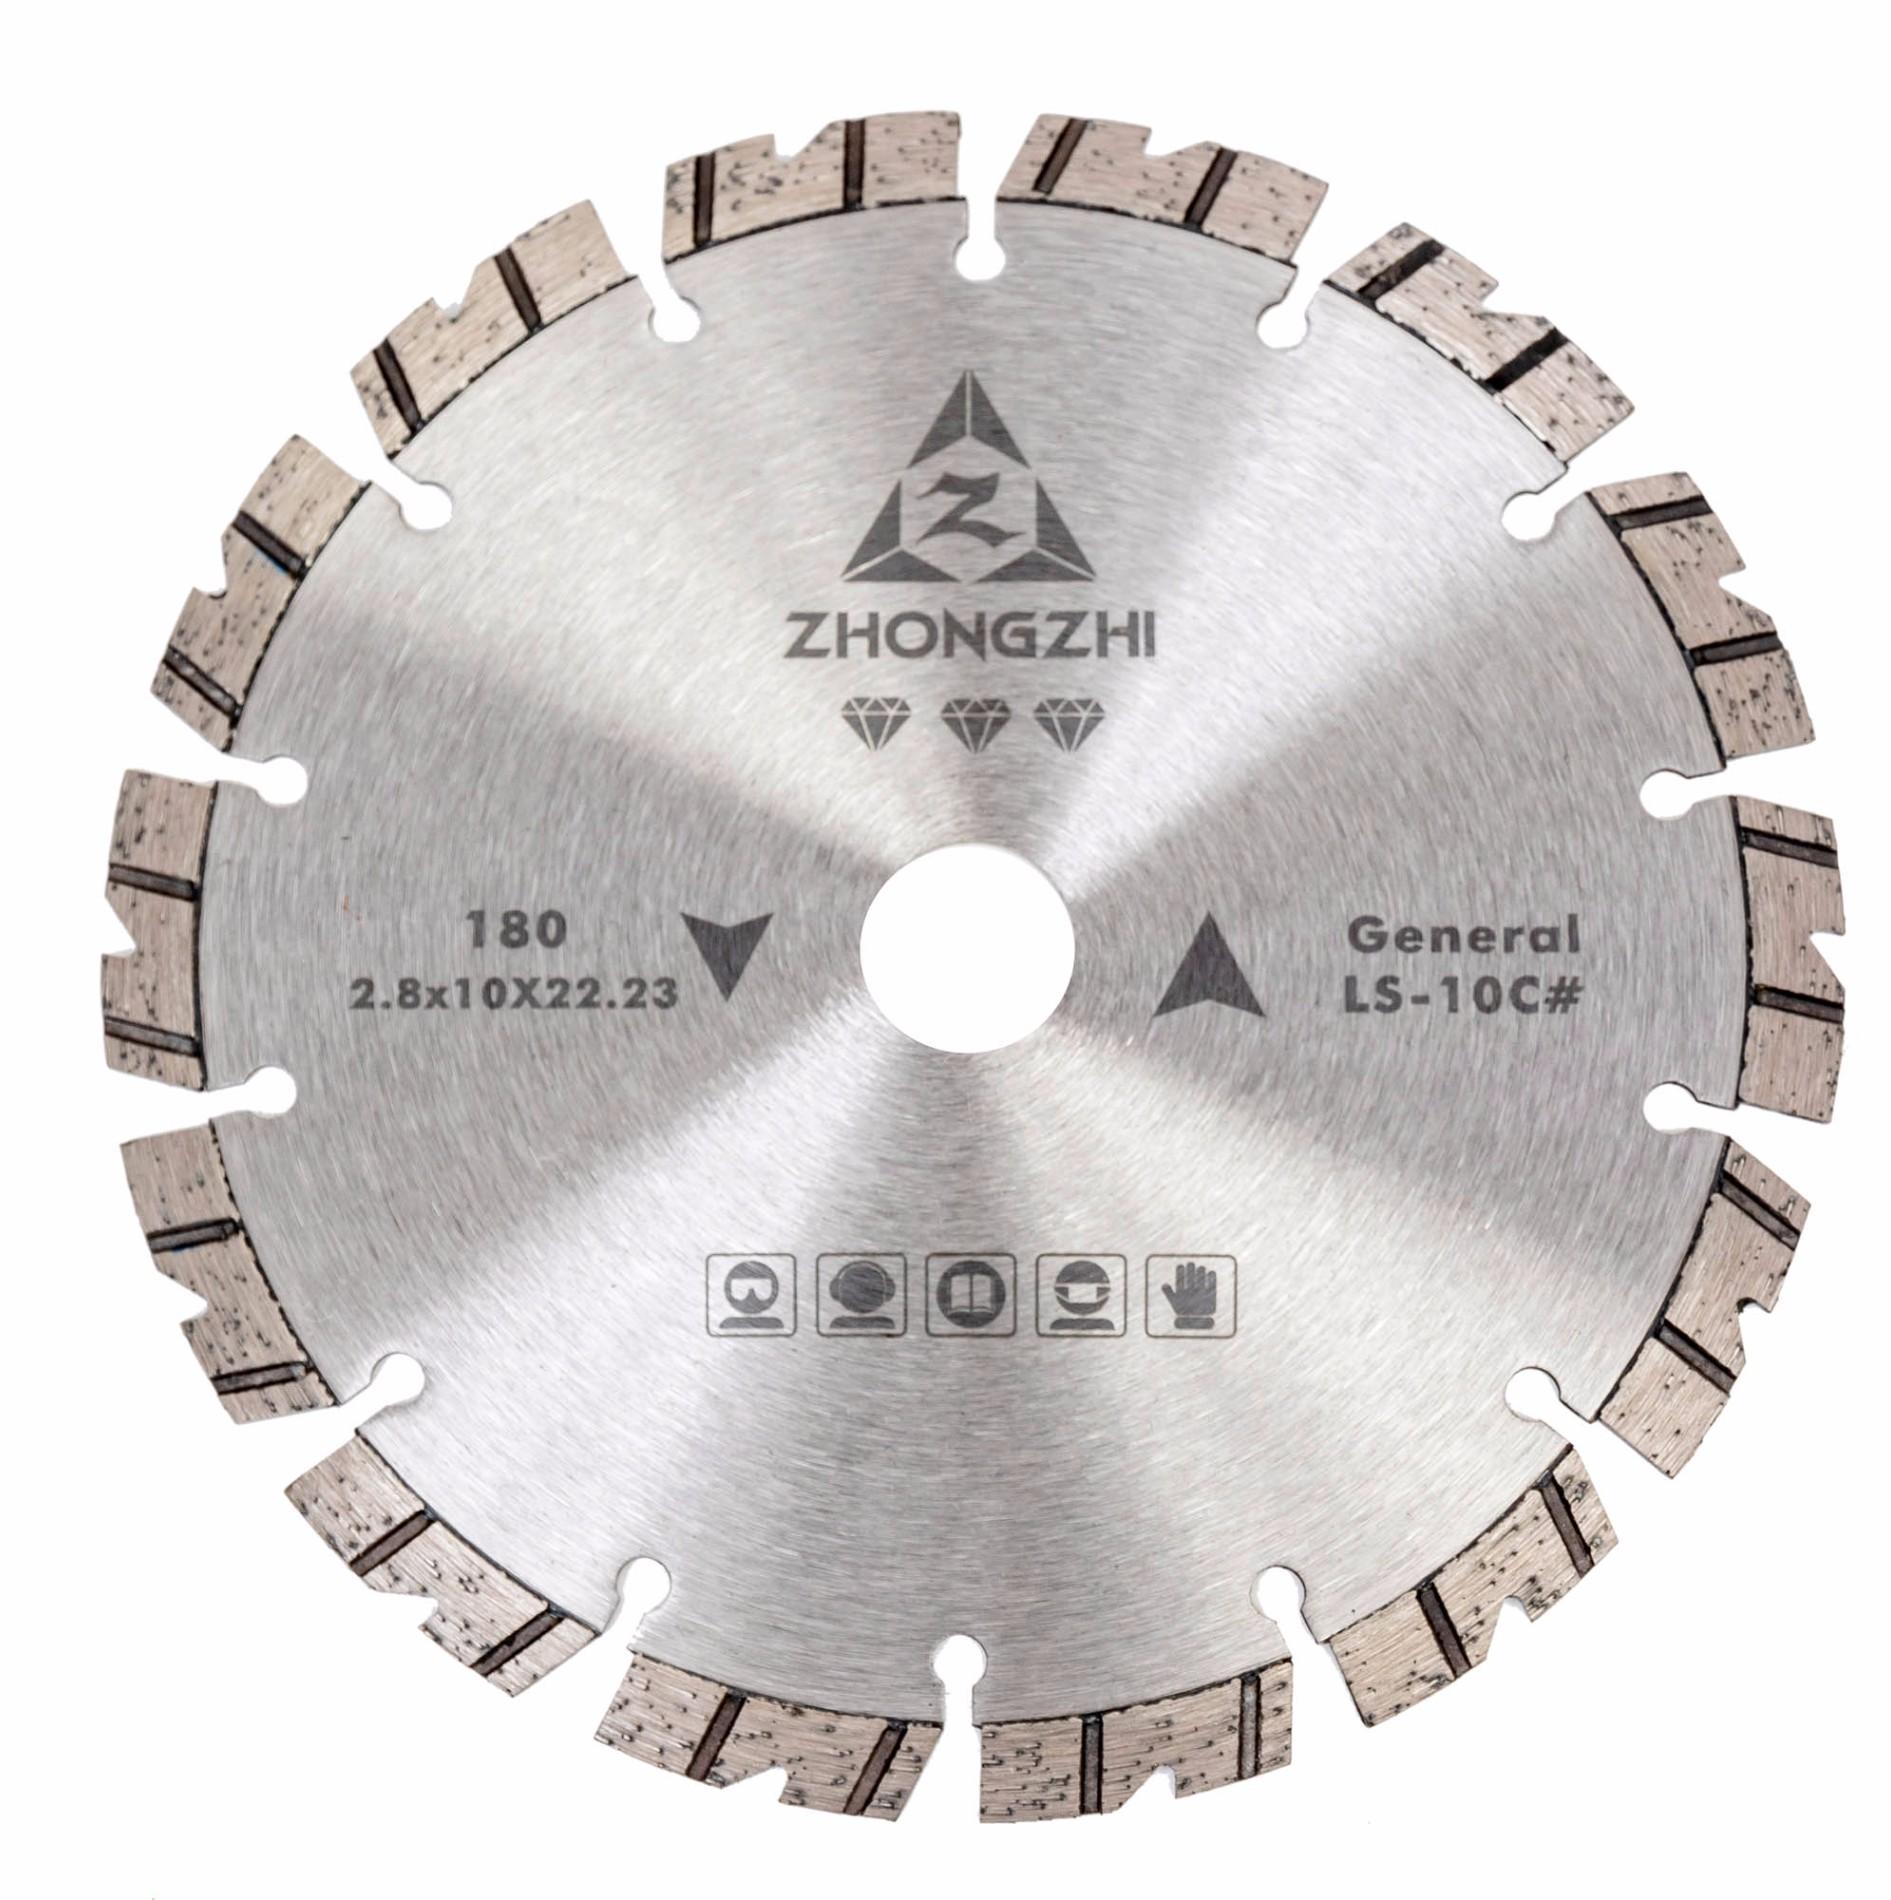 Ideal Chip Removal and Cooling V-Shaped Laser Turbo Bevel Segmented Blade for Angle Grinder